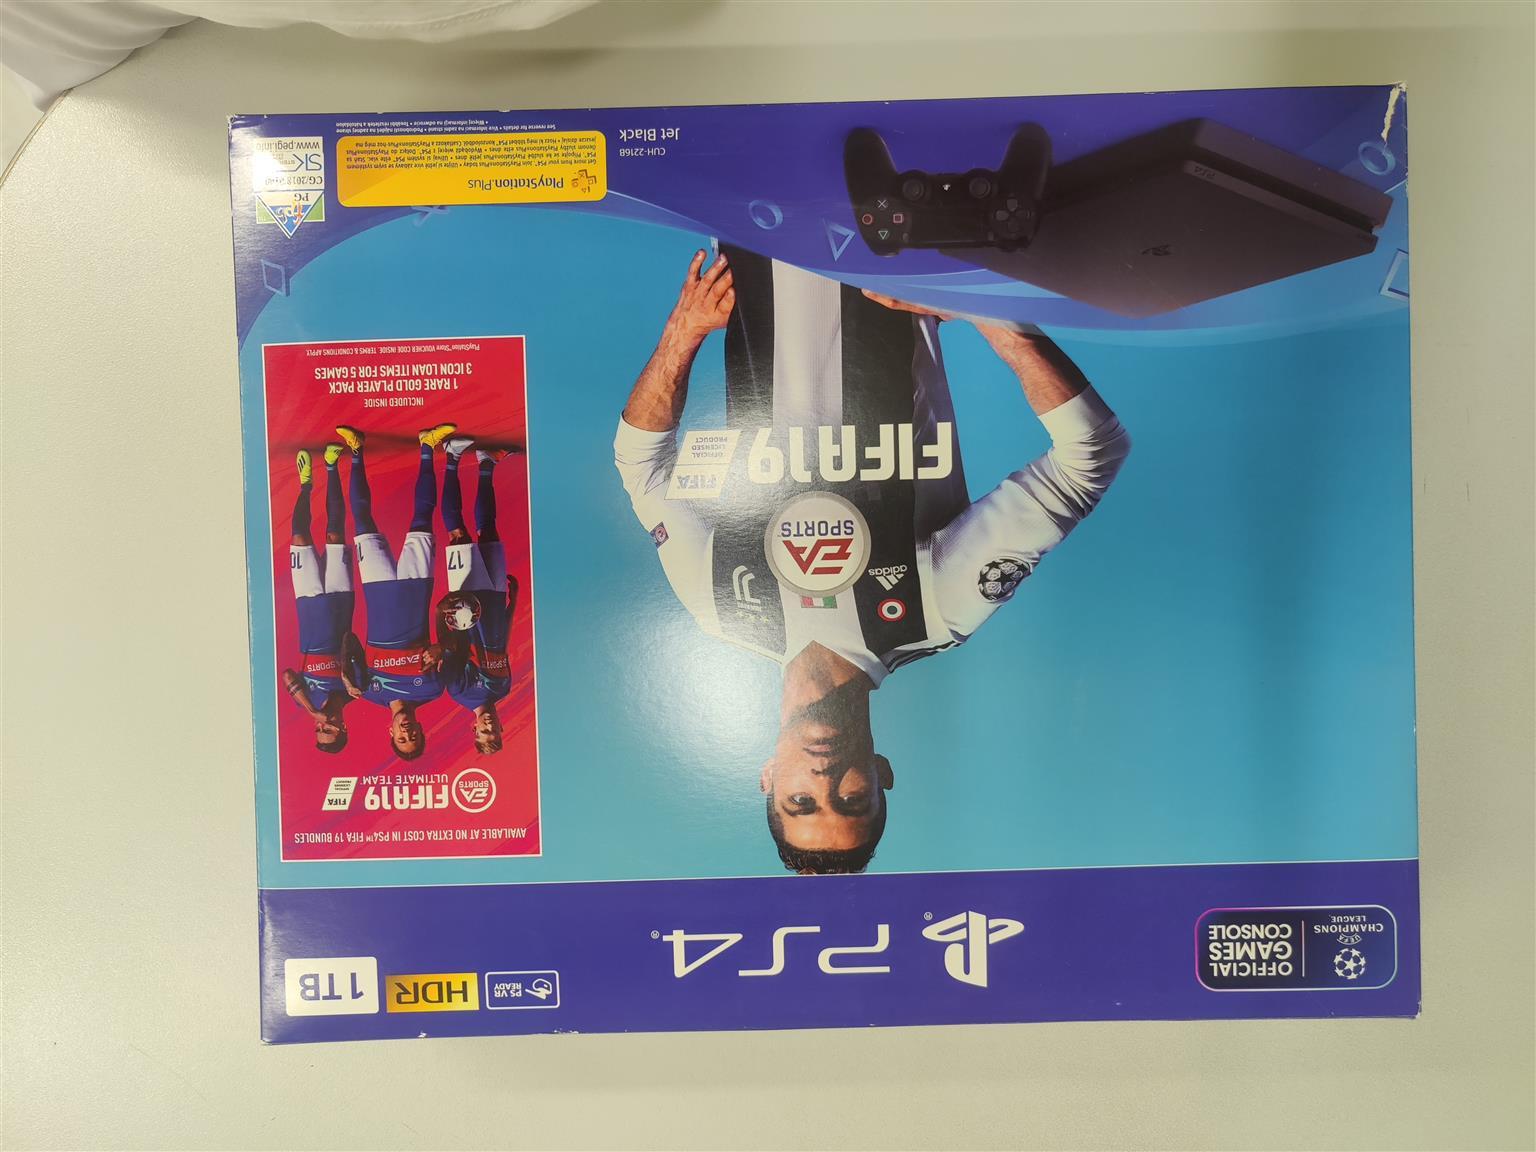 Ps4 1tb slim fifa 19 bundle brand new in the box